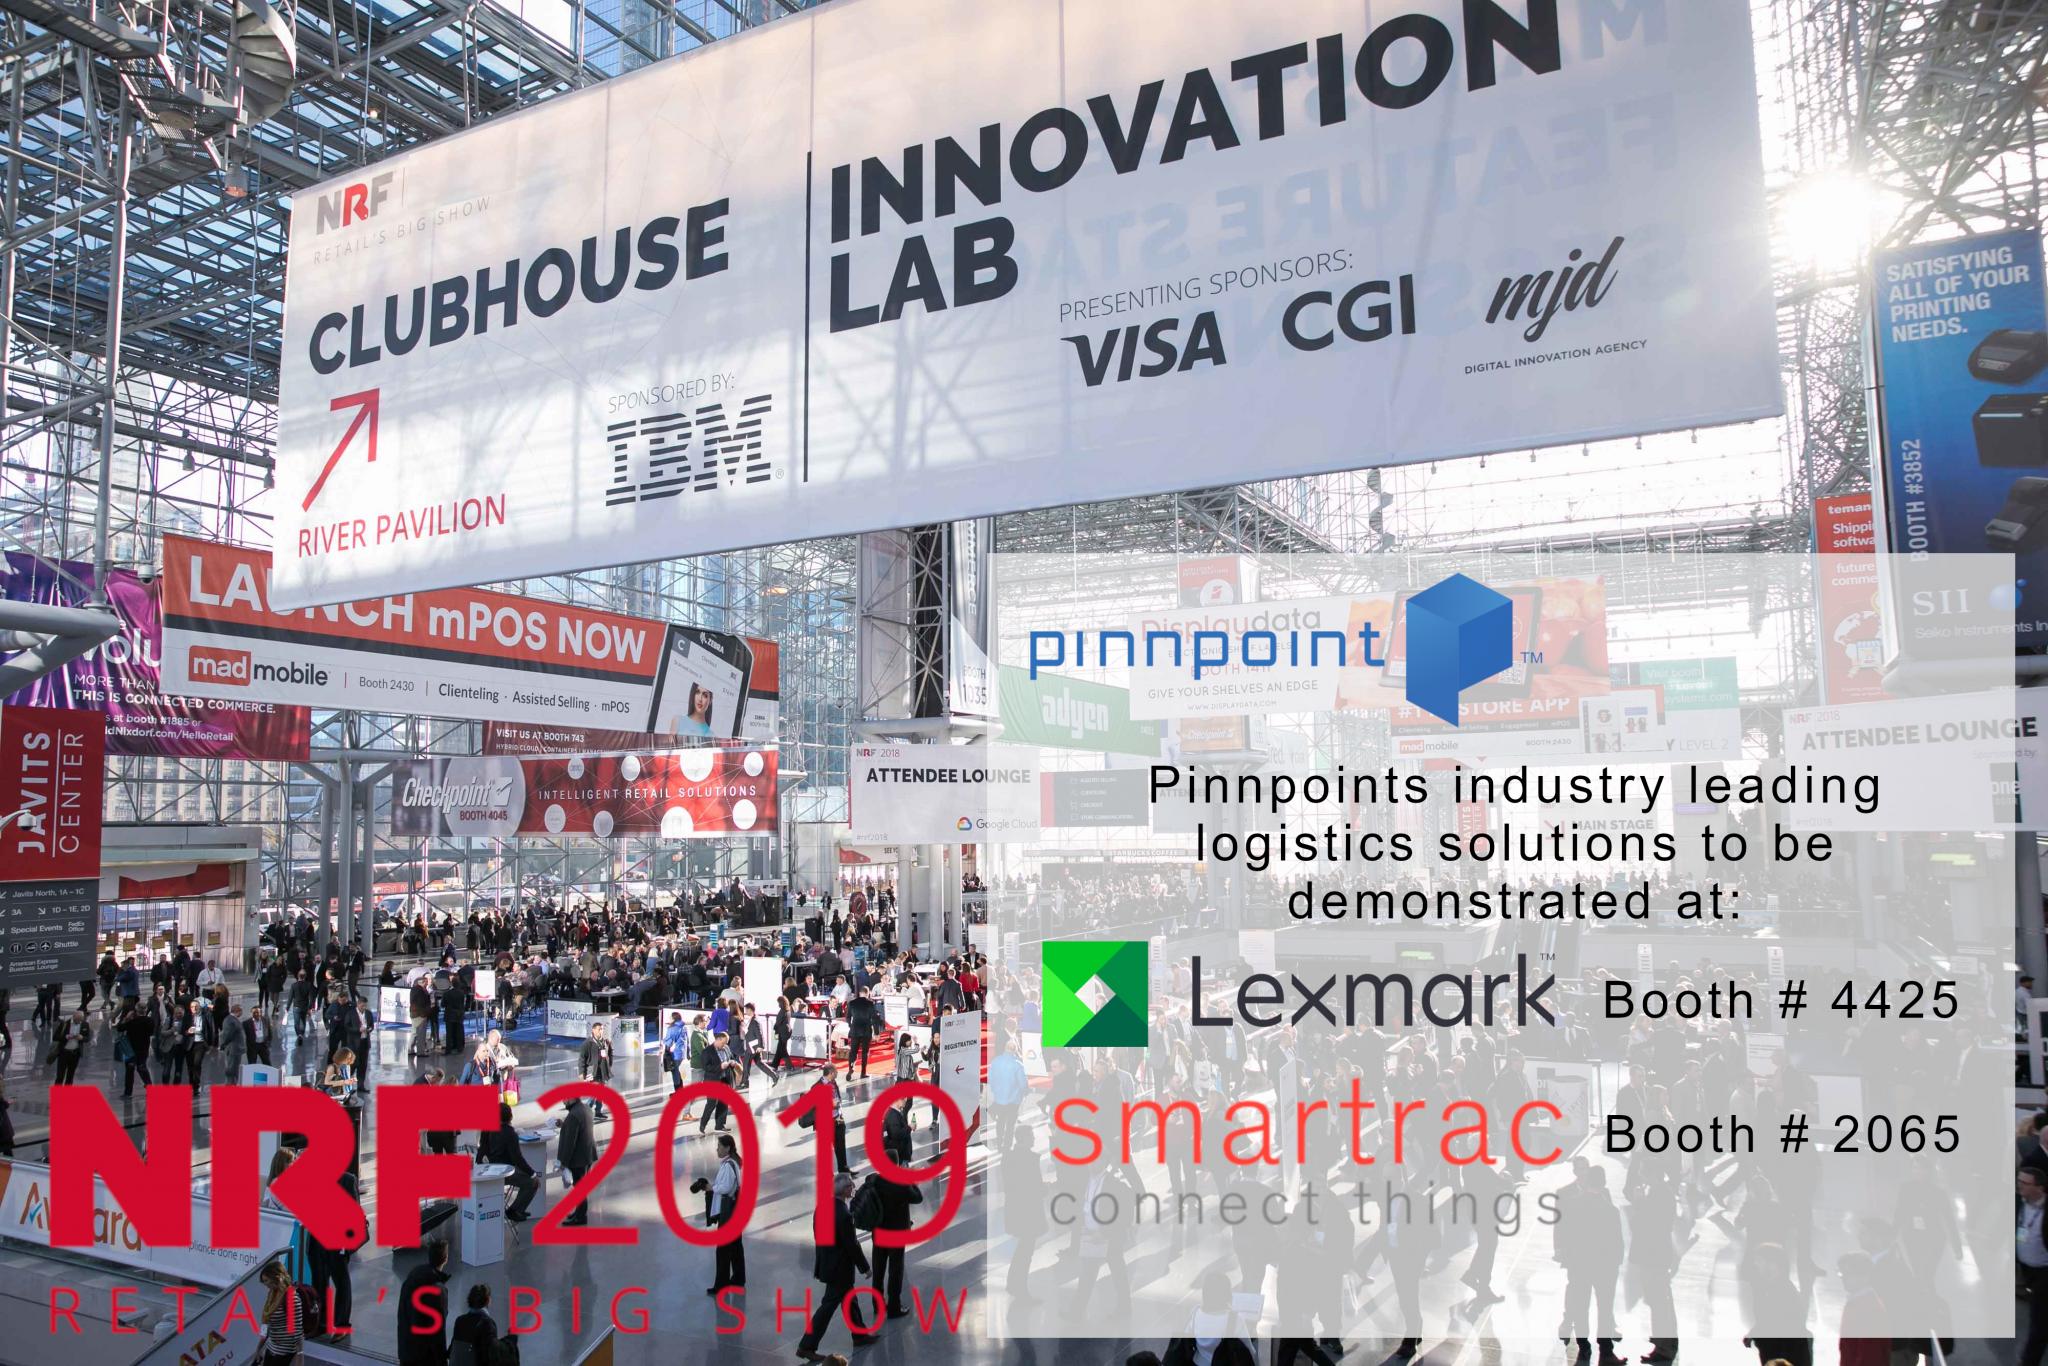 NRF-2019 Pinnpoint Lexmark Smartrac